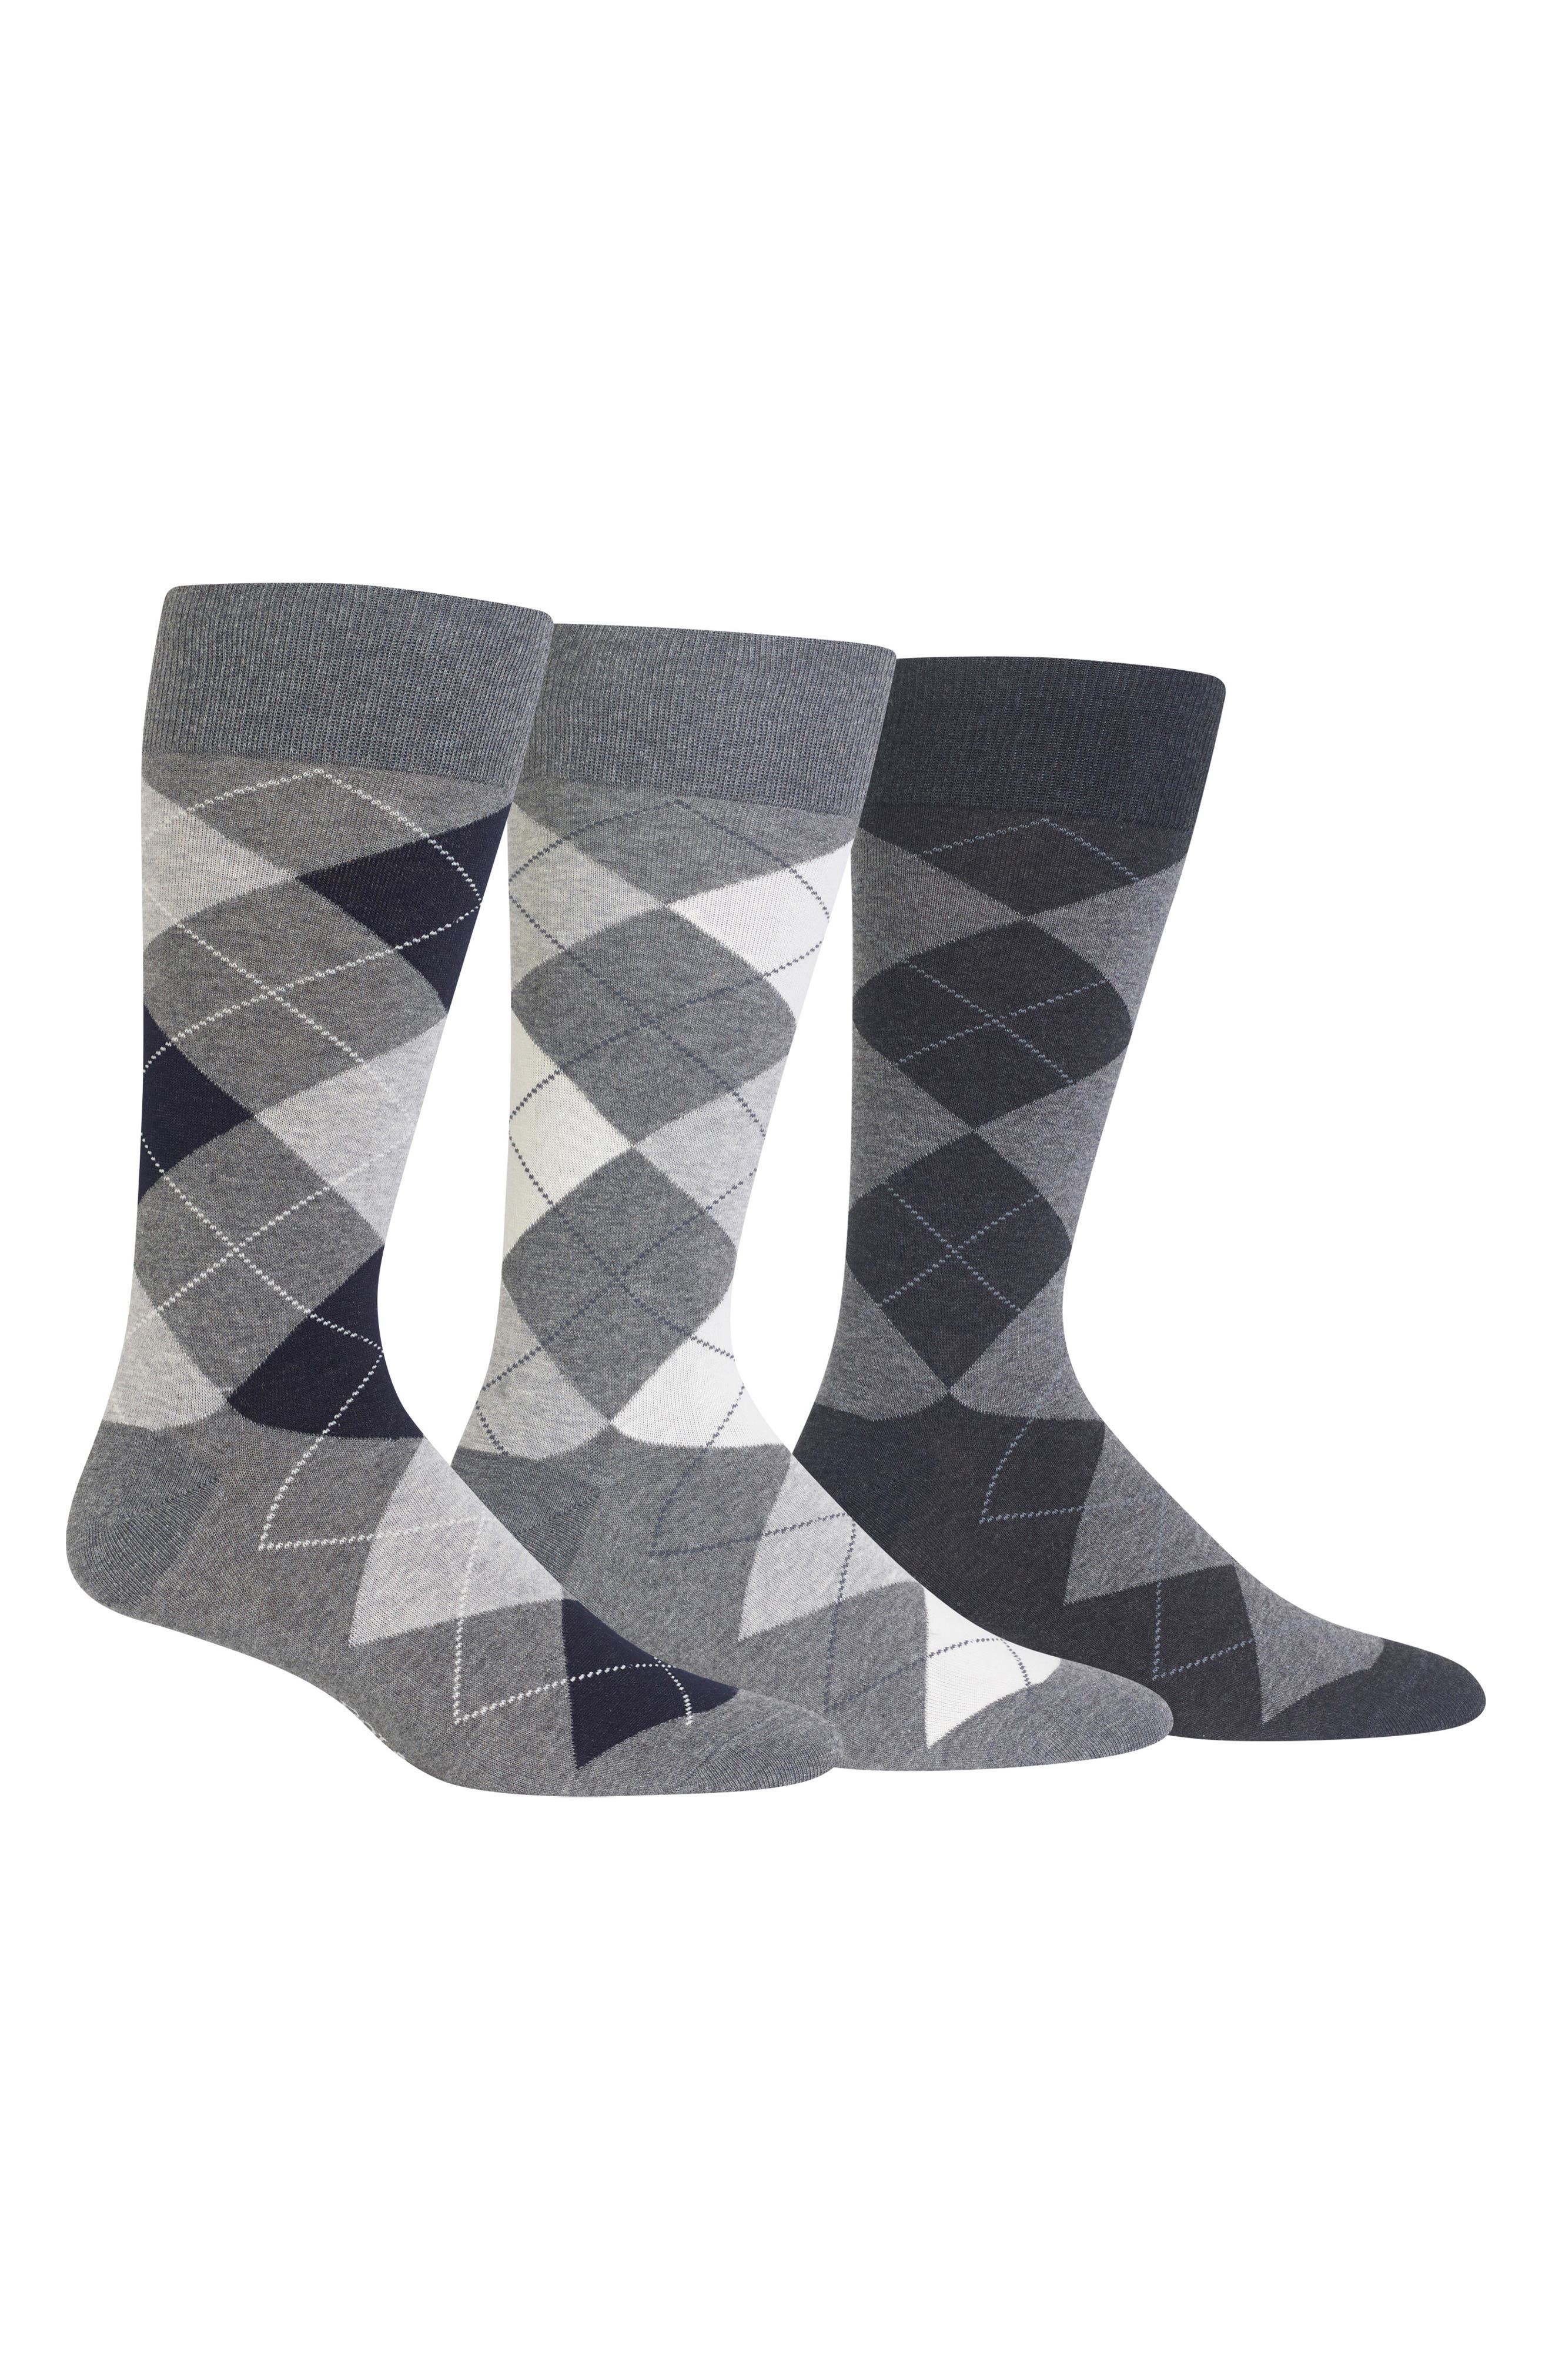 3-Pack Argyle Socks,                         Main,                         color, 023